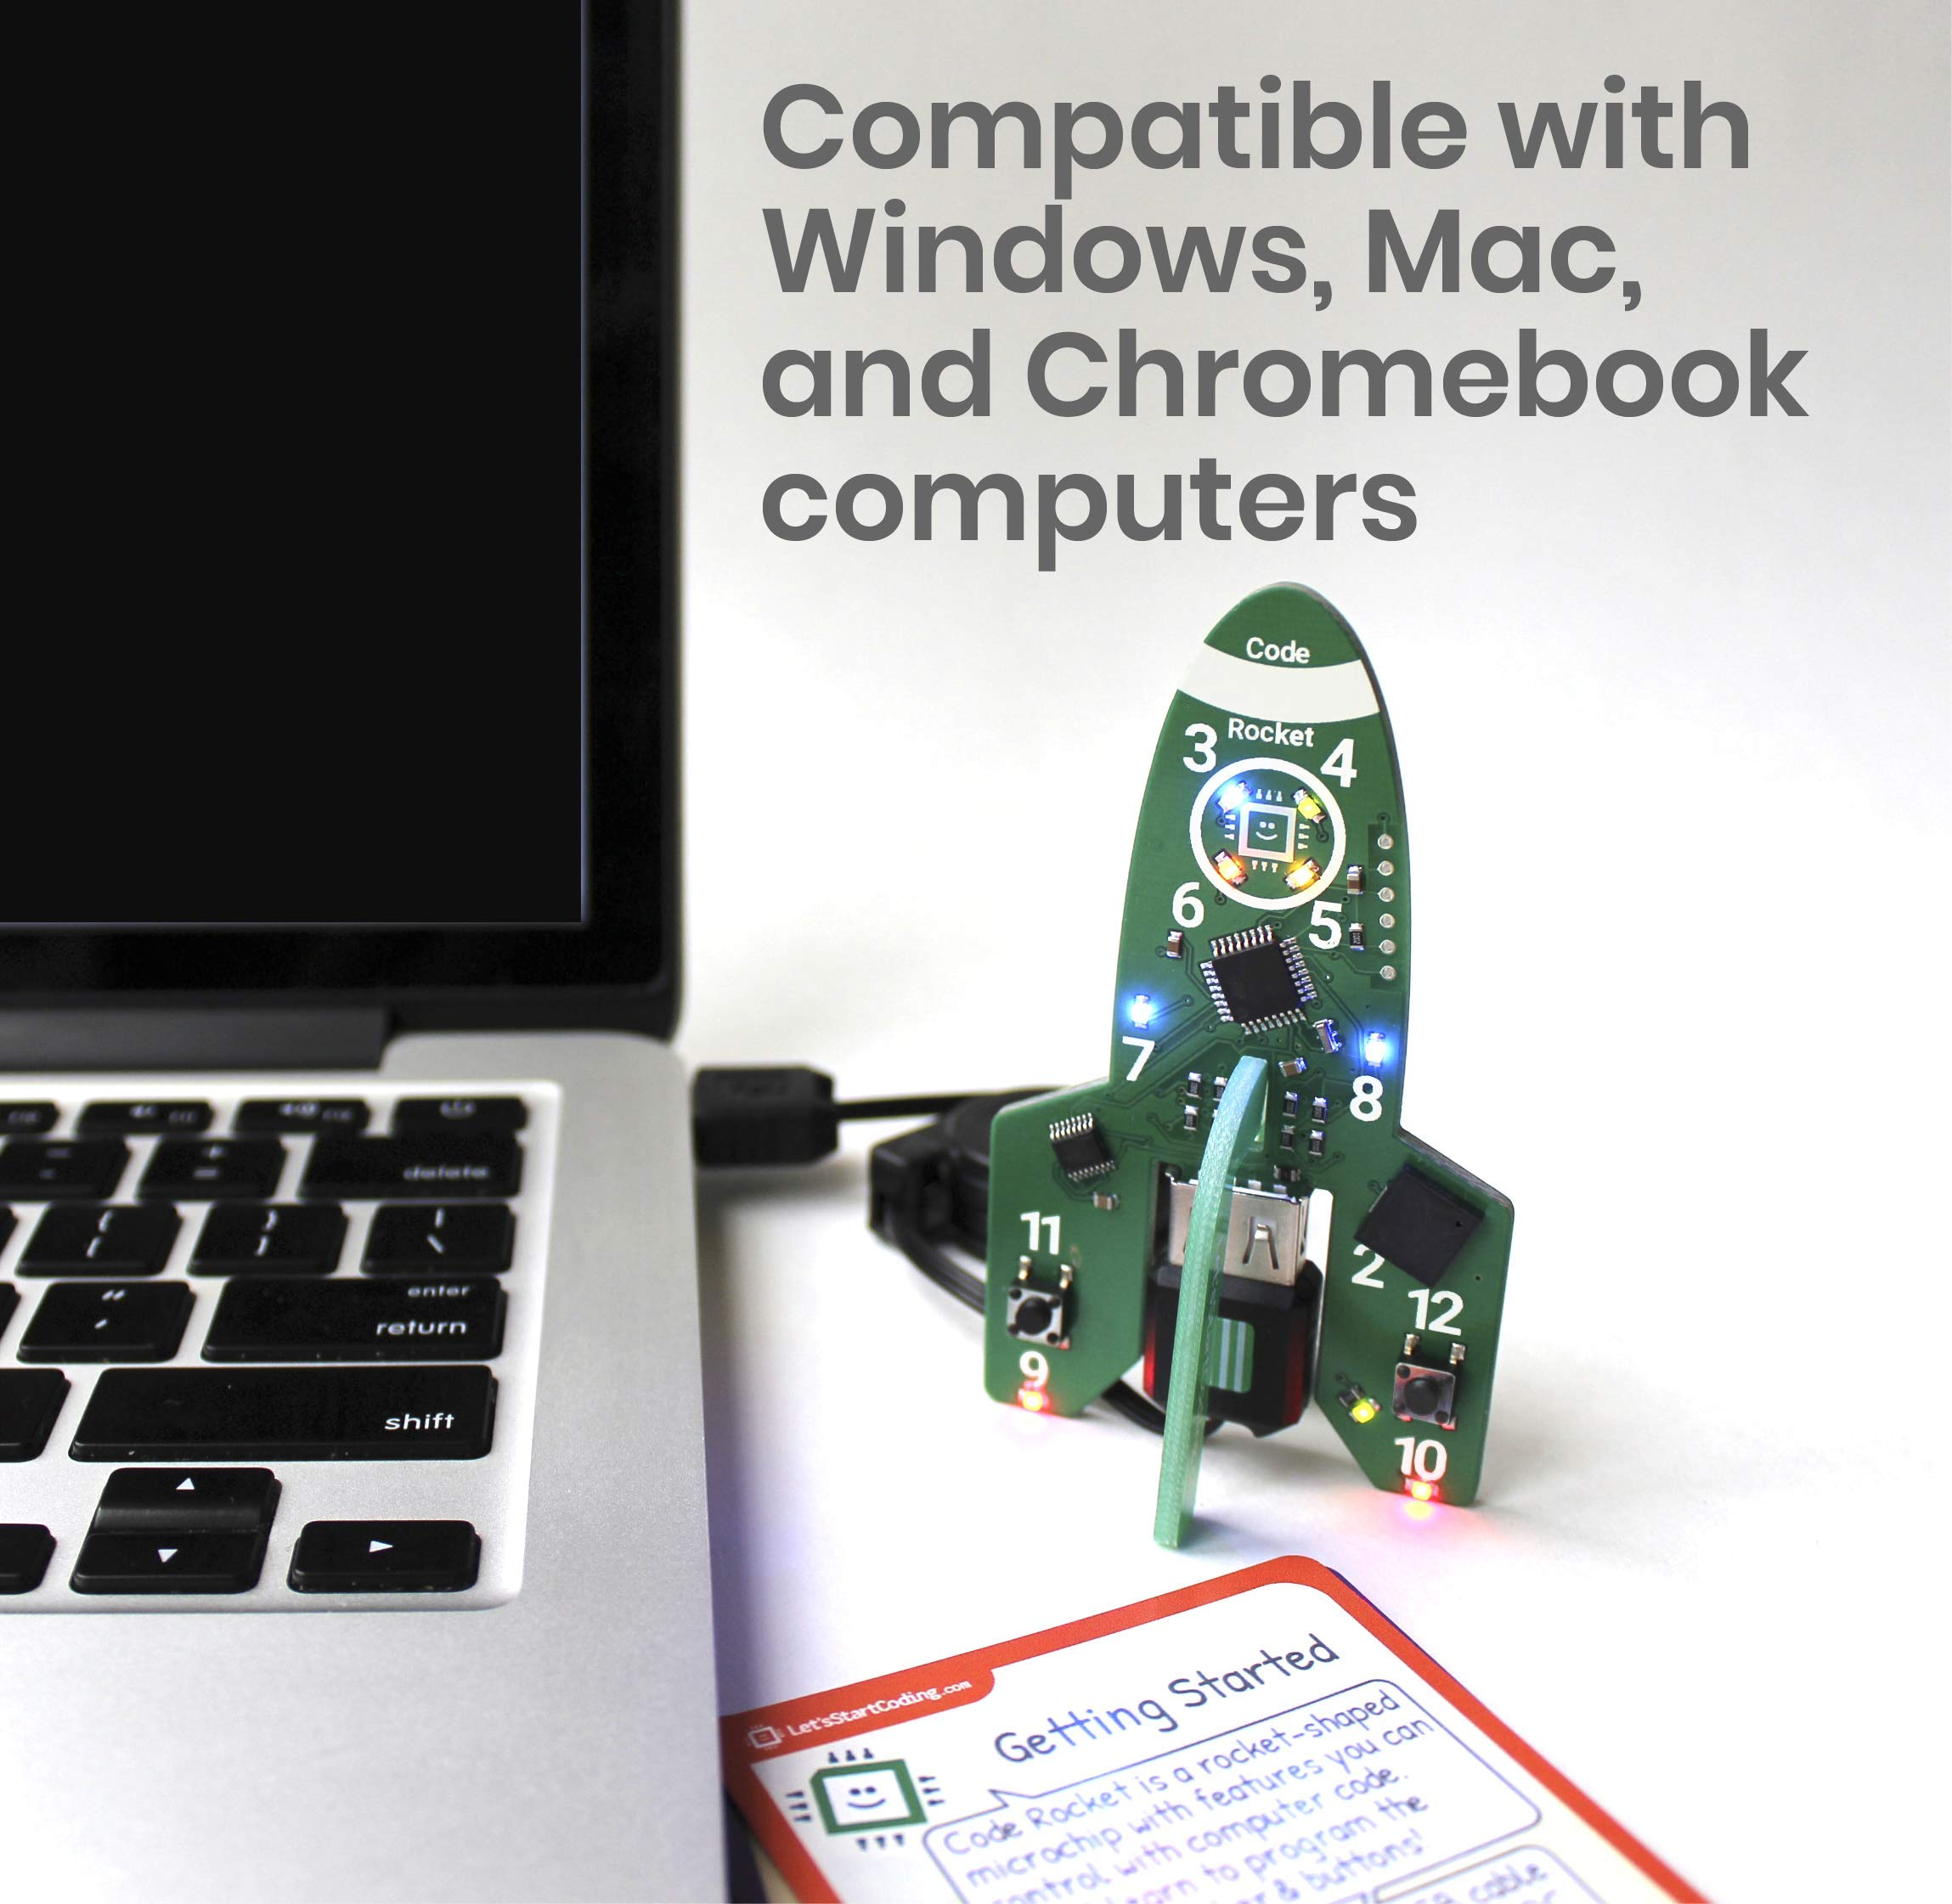 Bundle: Ultimate Kit + Car + Rocket + Piano + Speaker | Coding Kits for Kids 8-13 | Bundle and Save! by Let's Start Coding (Image #7)